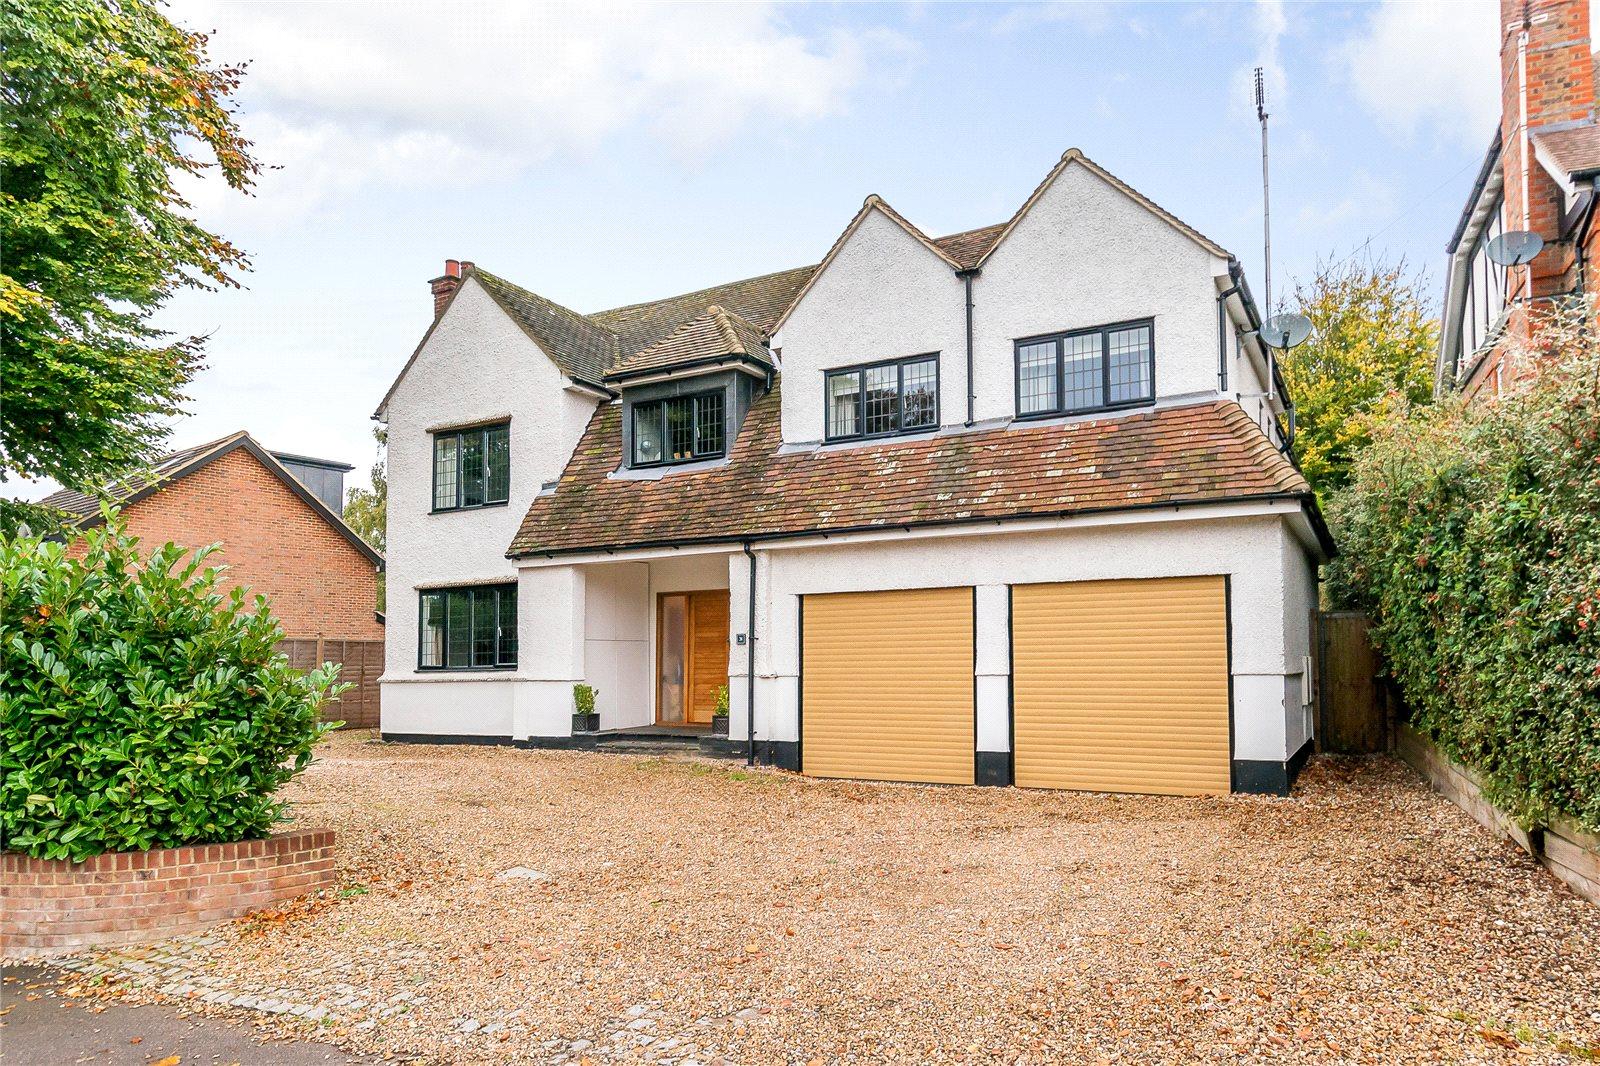 Maison unifamiliale pour l Vente à Crabtree Lane, Harpenden, Hertfordshire, AL5 Harpenden, Angleterre